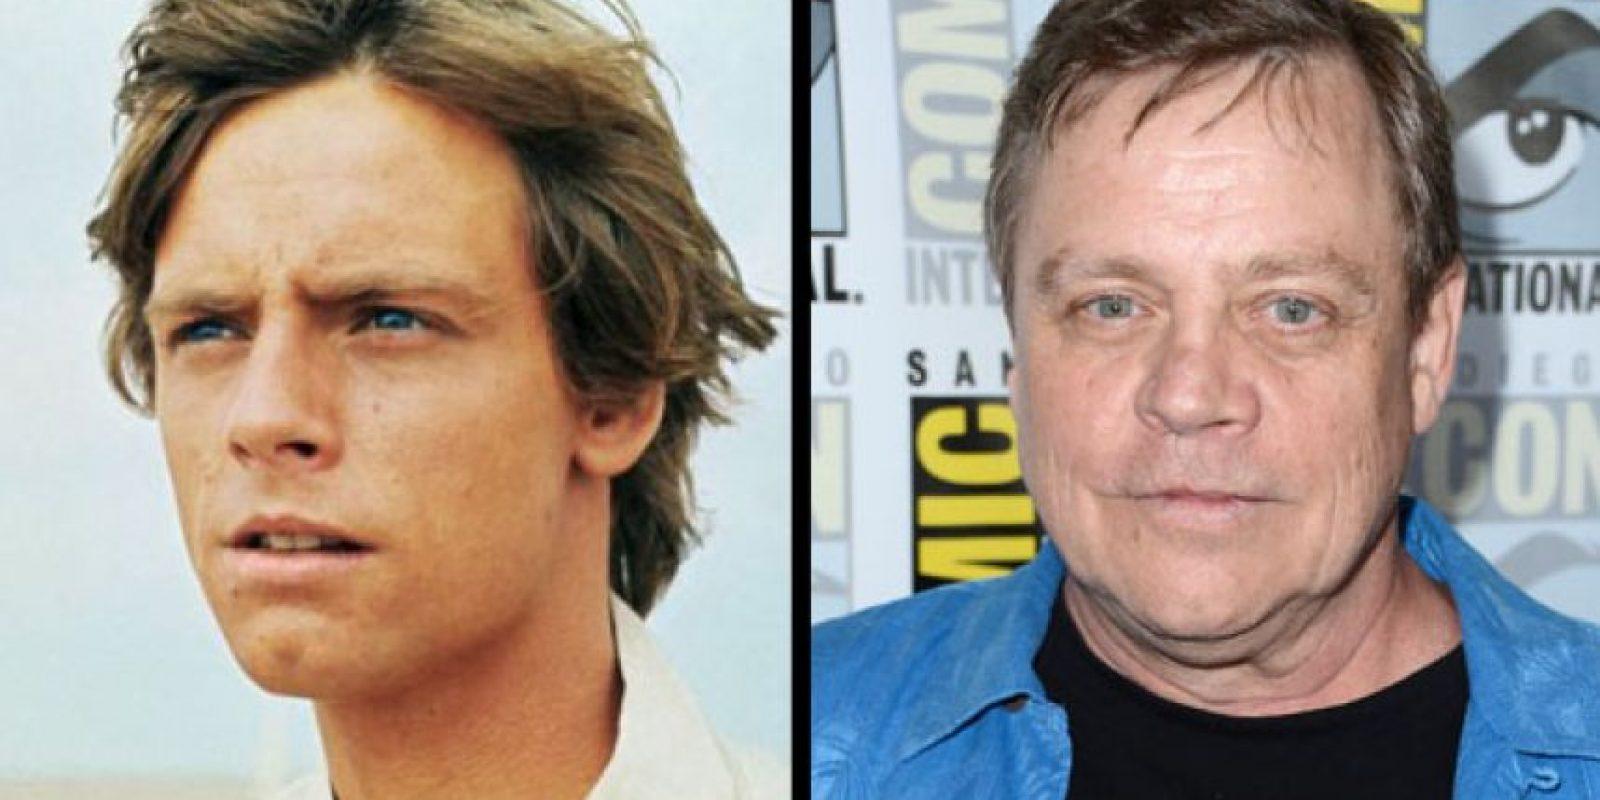 Mark Hammill interpretó a Luke Skywalker. Este papel destruyó su carrera. Foto: THR